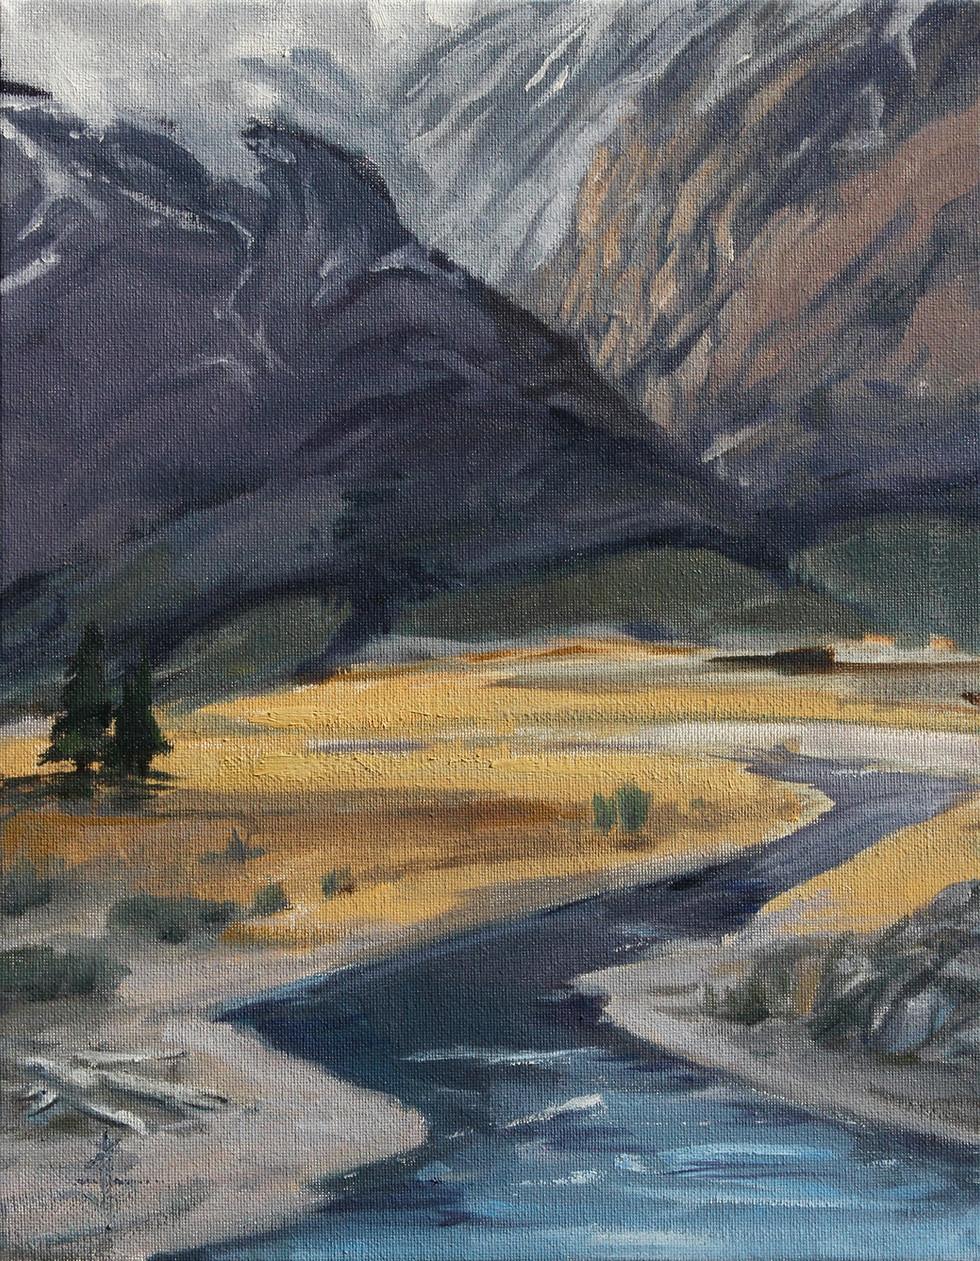 Mammoth Valley